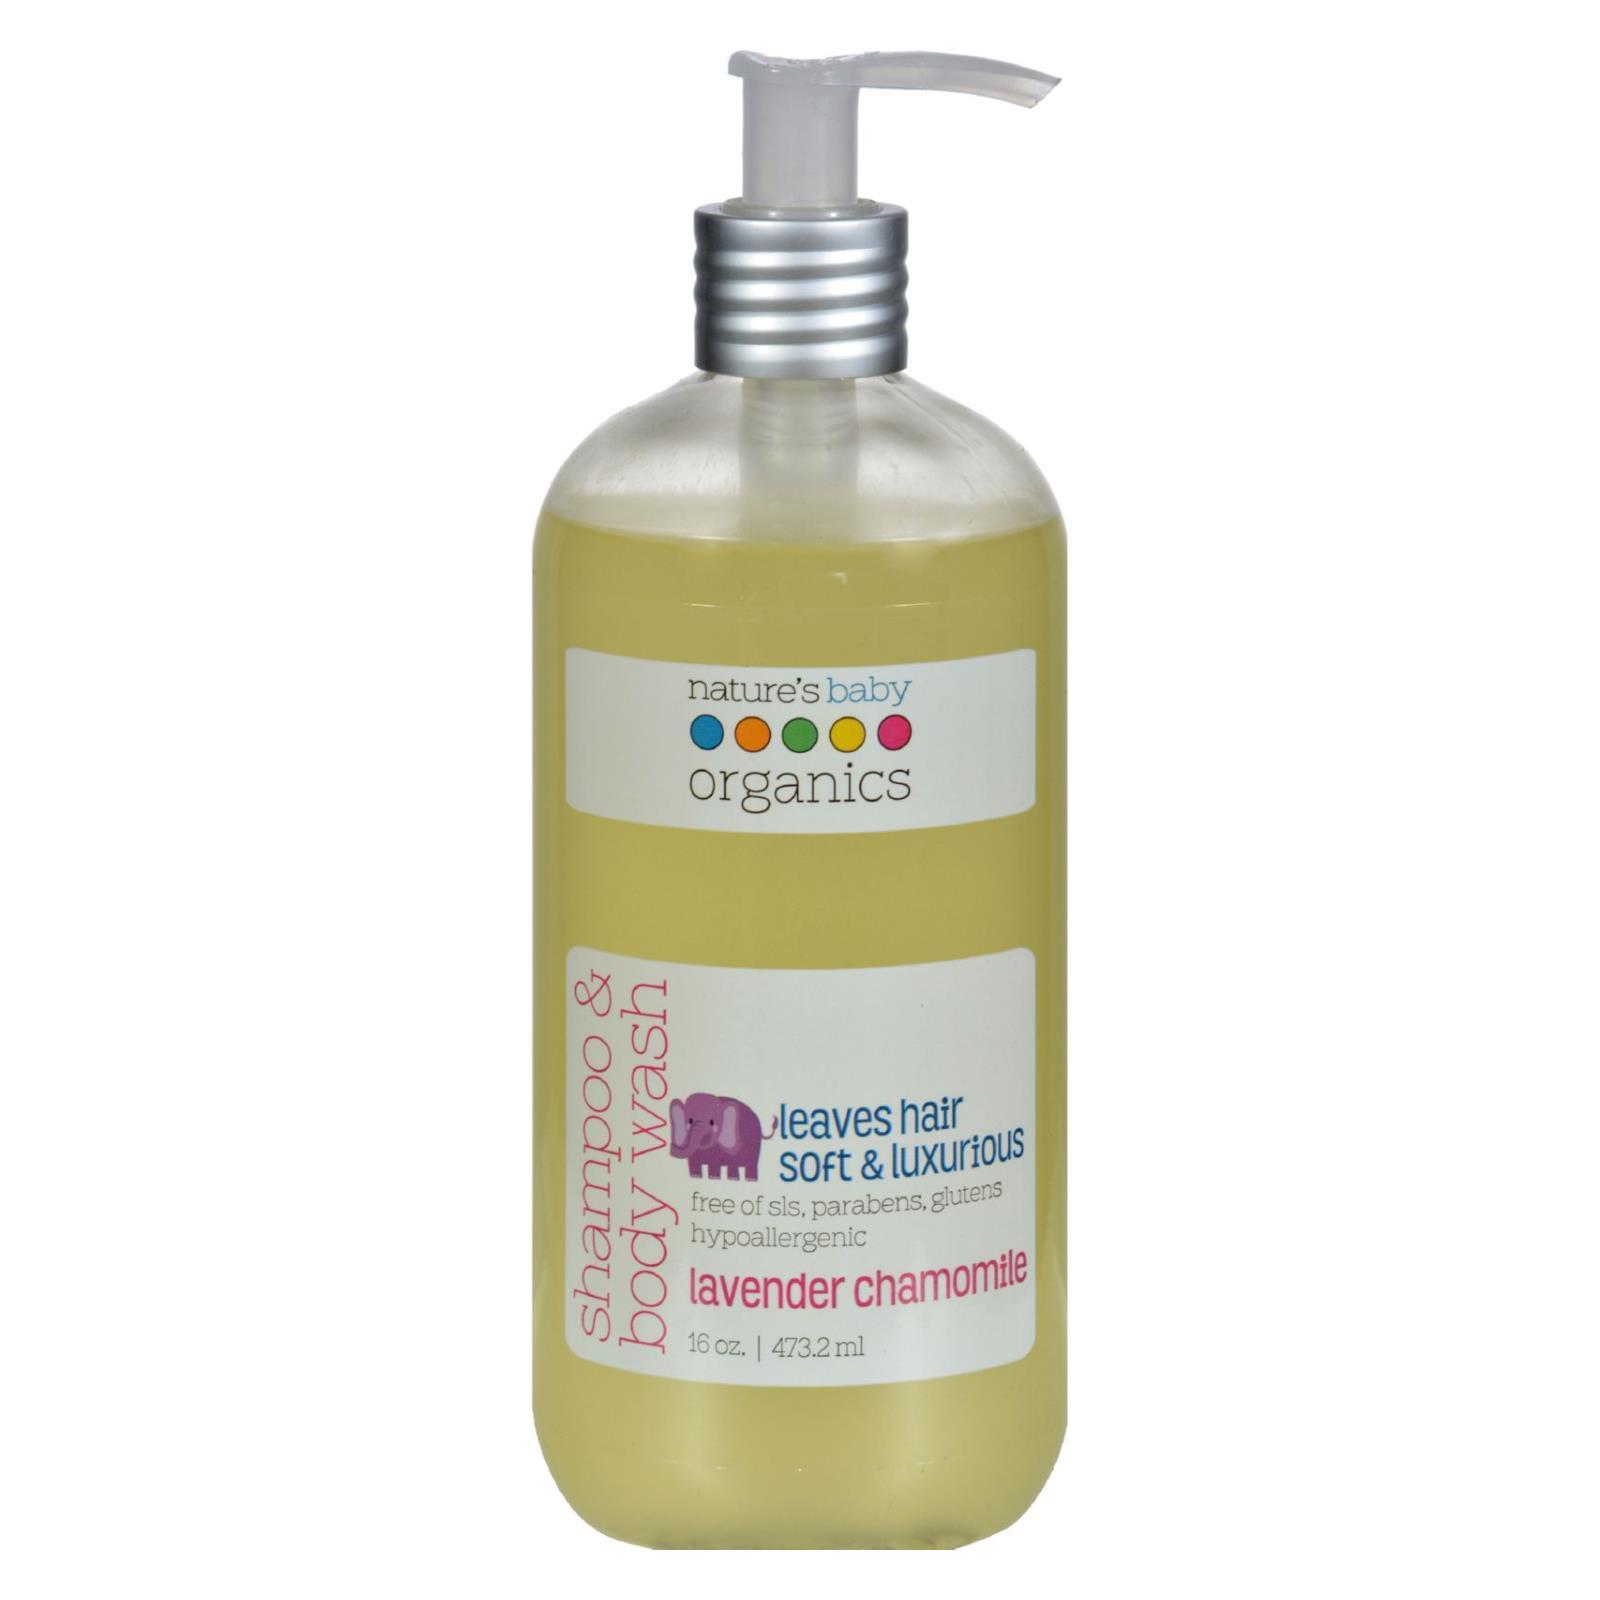 Nature's Baby Organics Shampoo and Body Wash Lavender Chamomile - 16 fl oz